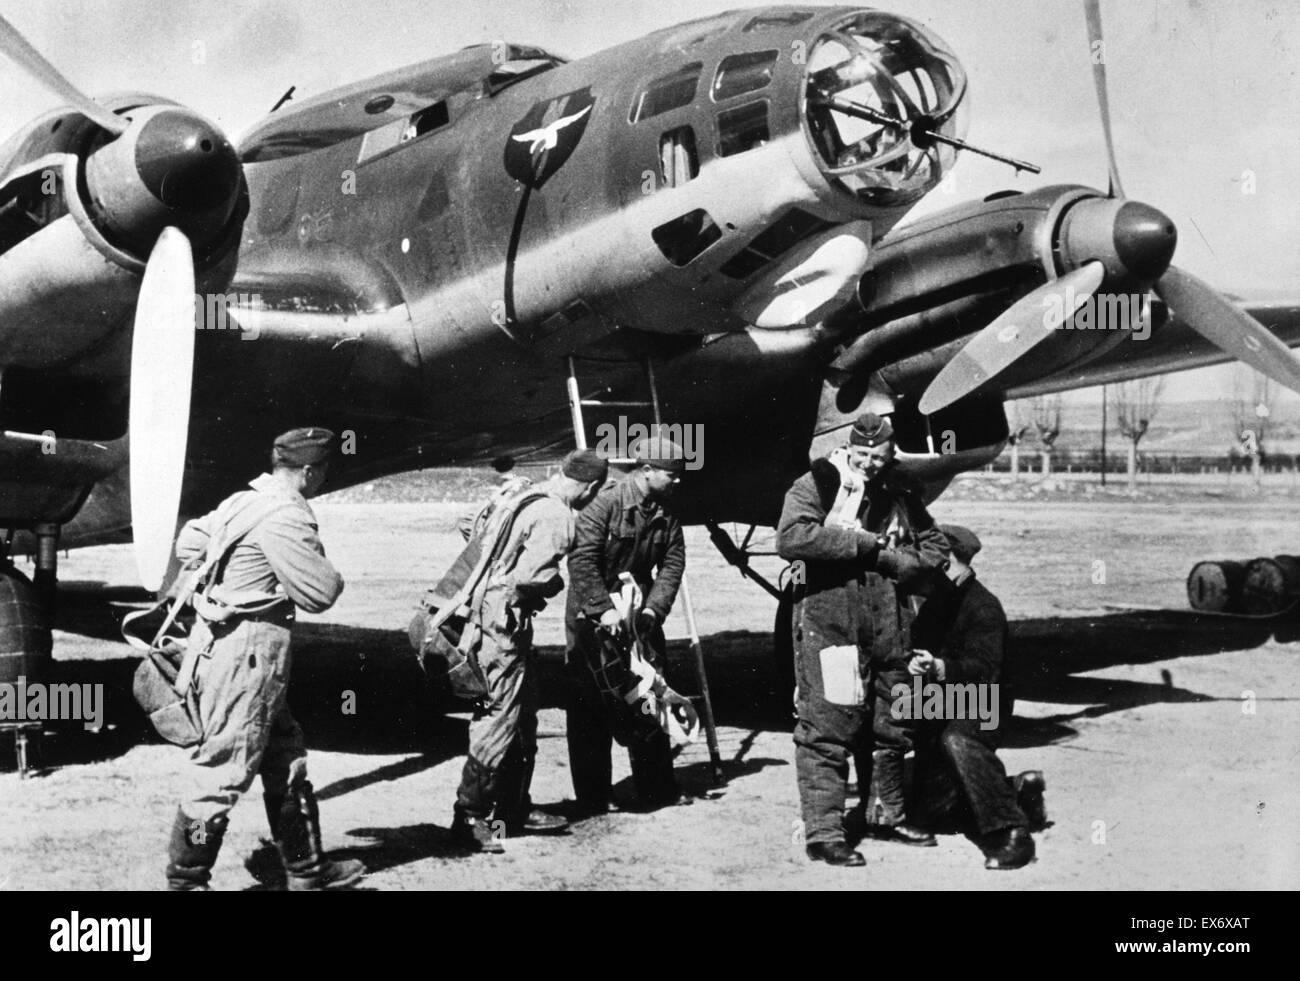 Spanish Civil War: A crew belonging to the Condor Legion stand near a Heinkel aircraft. 1938 - Stock Image